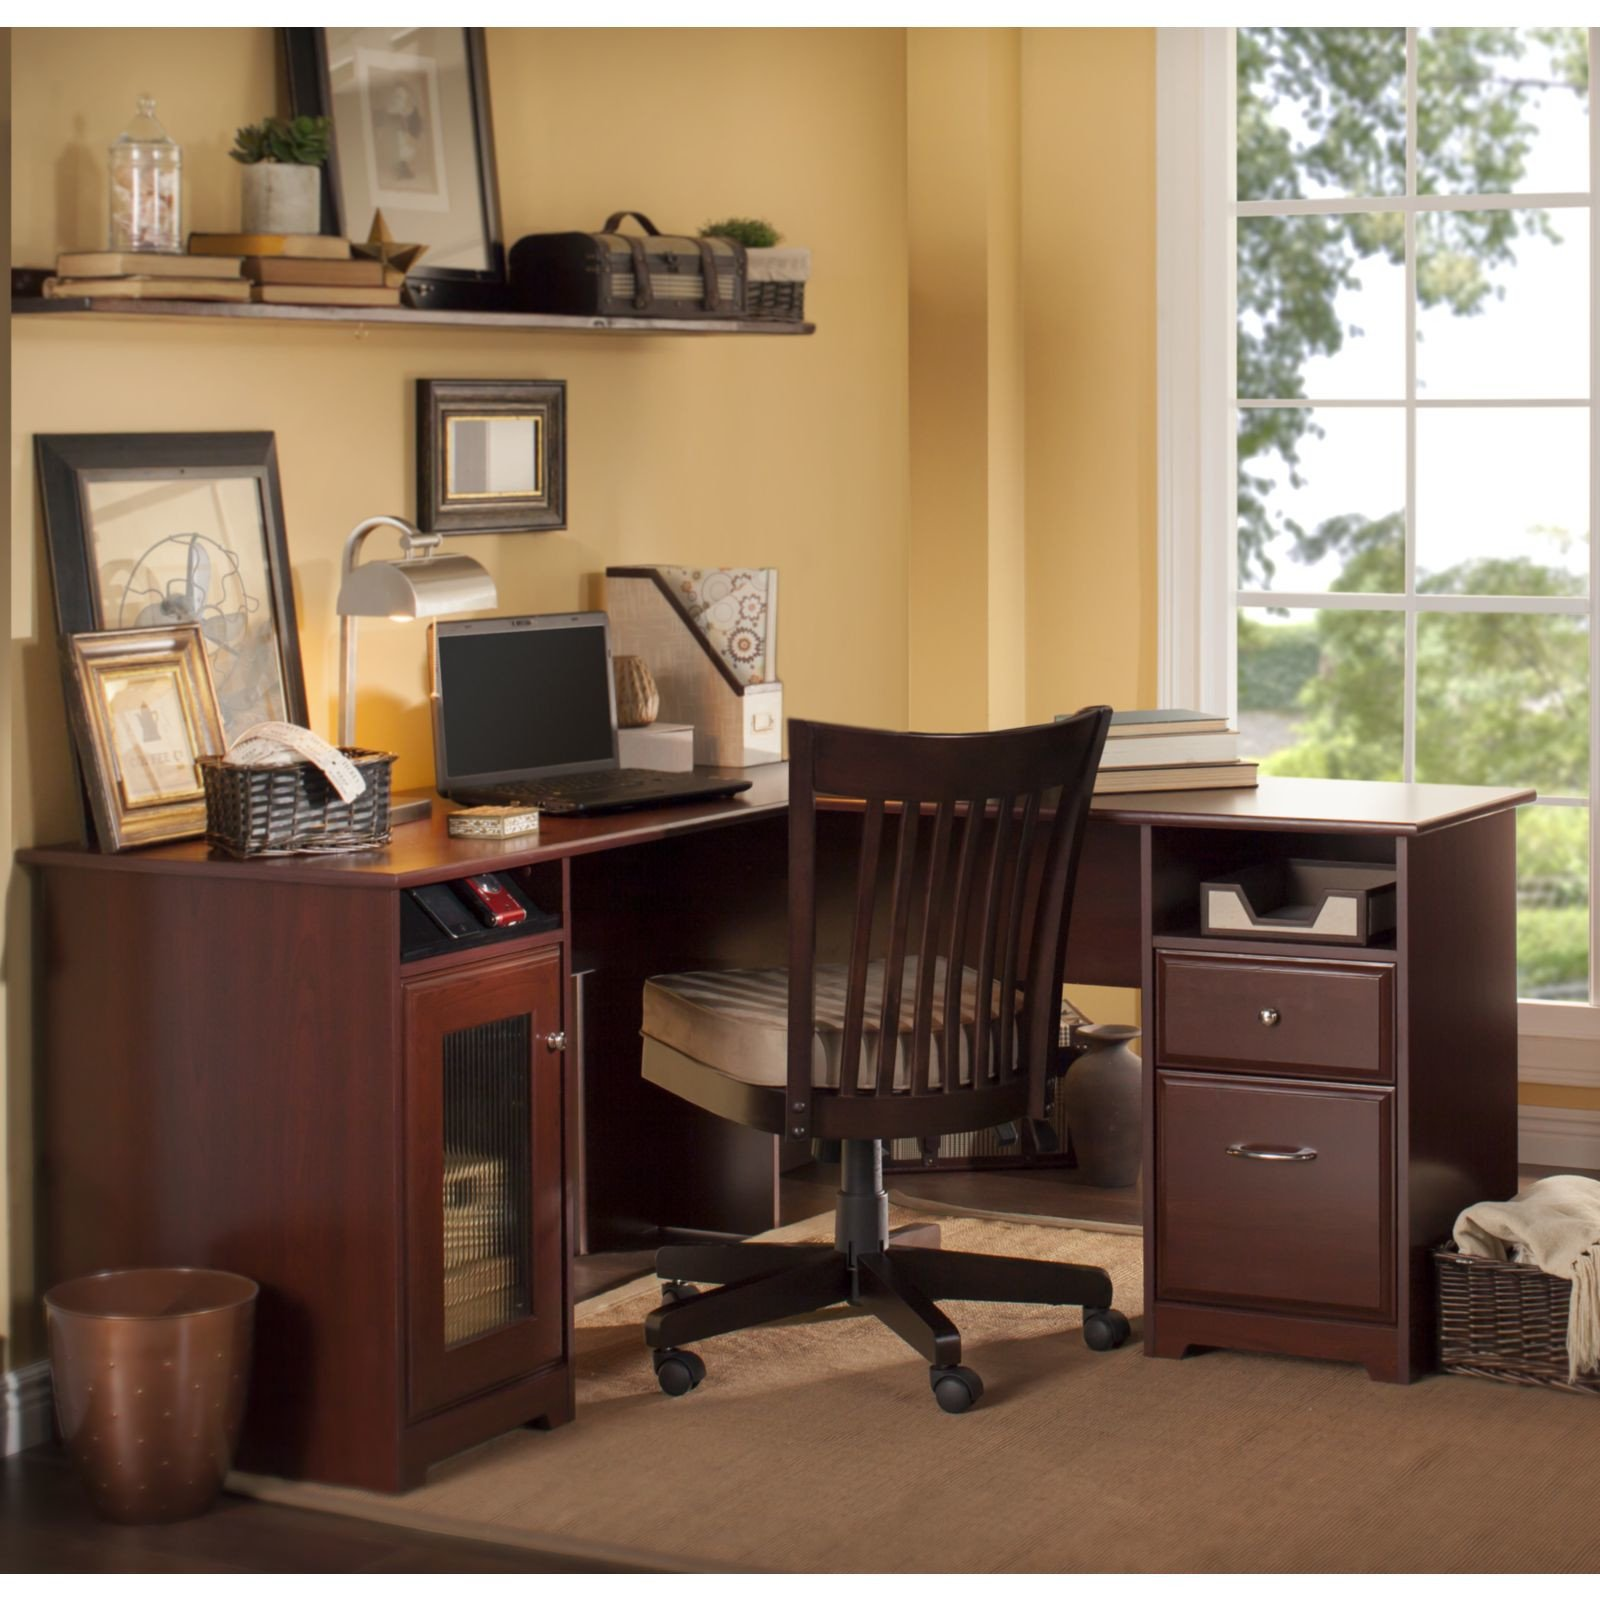 Premium L-Shaped Desk - Modern Stylish Executive Table Storage Organization Home Office Free eBook (Espresso Oak)